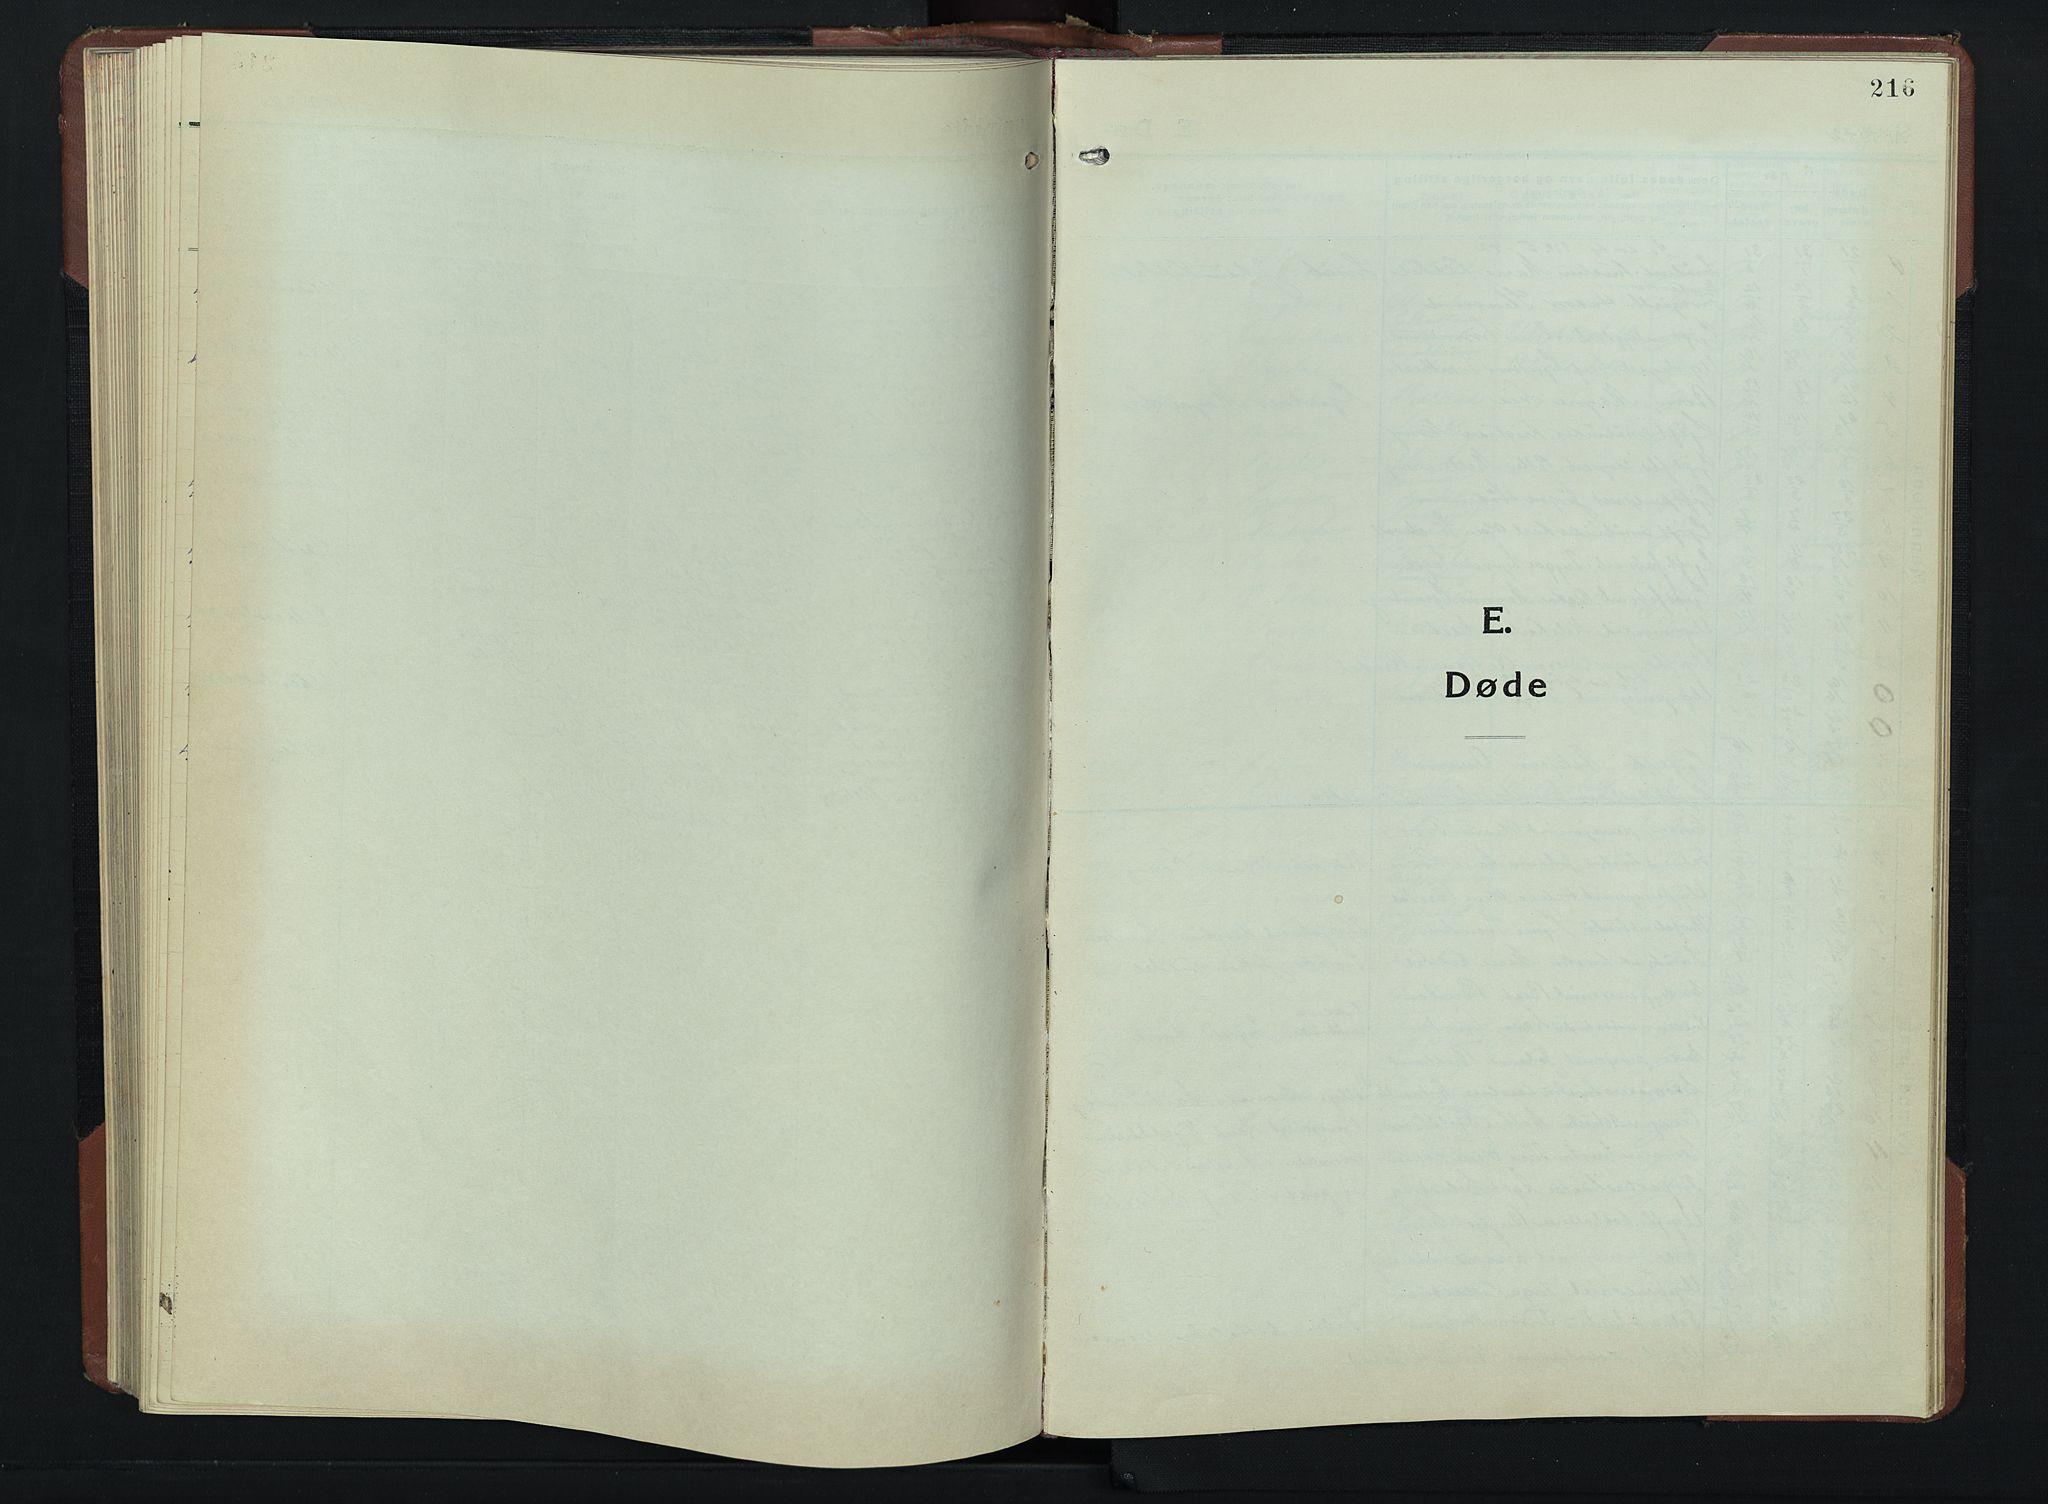 SAH, Vardal prestekontor, H/Ha/Hab/L0019: Klokkerbok nr. 19, 1941-1951, s. 216